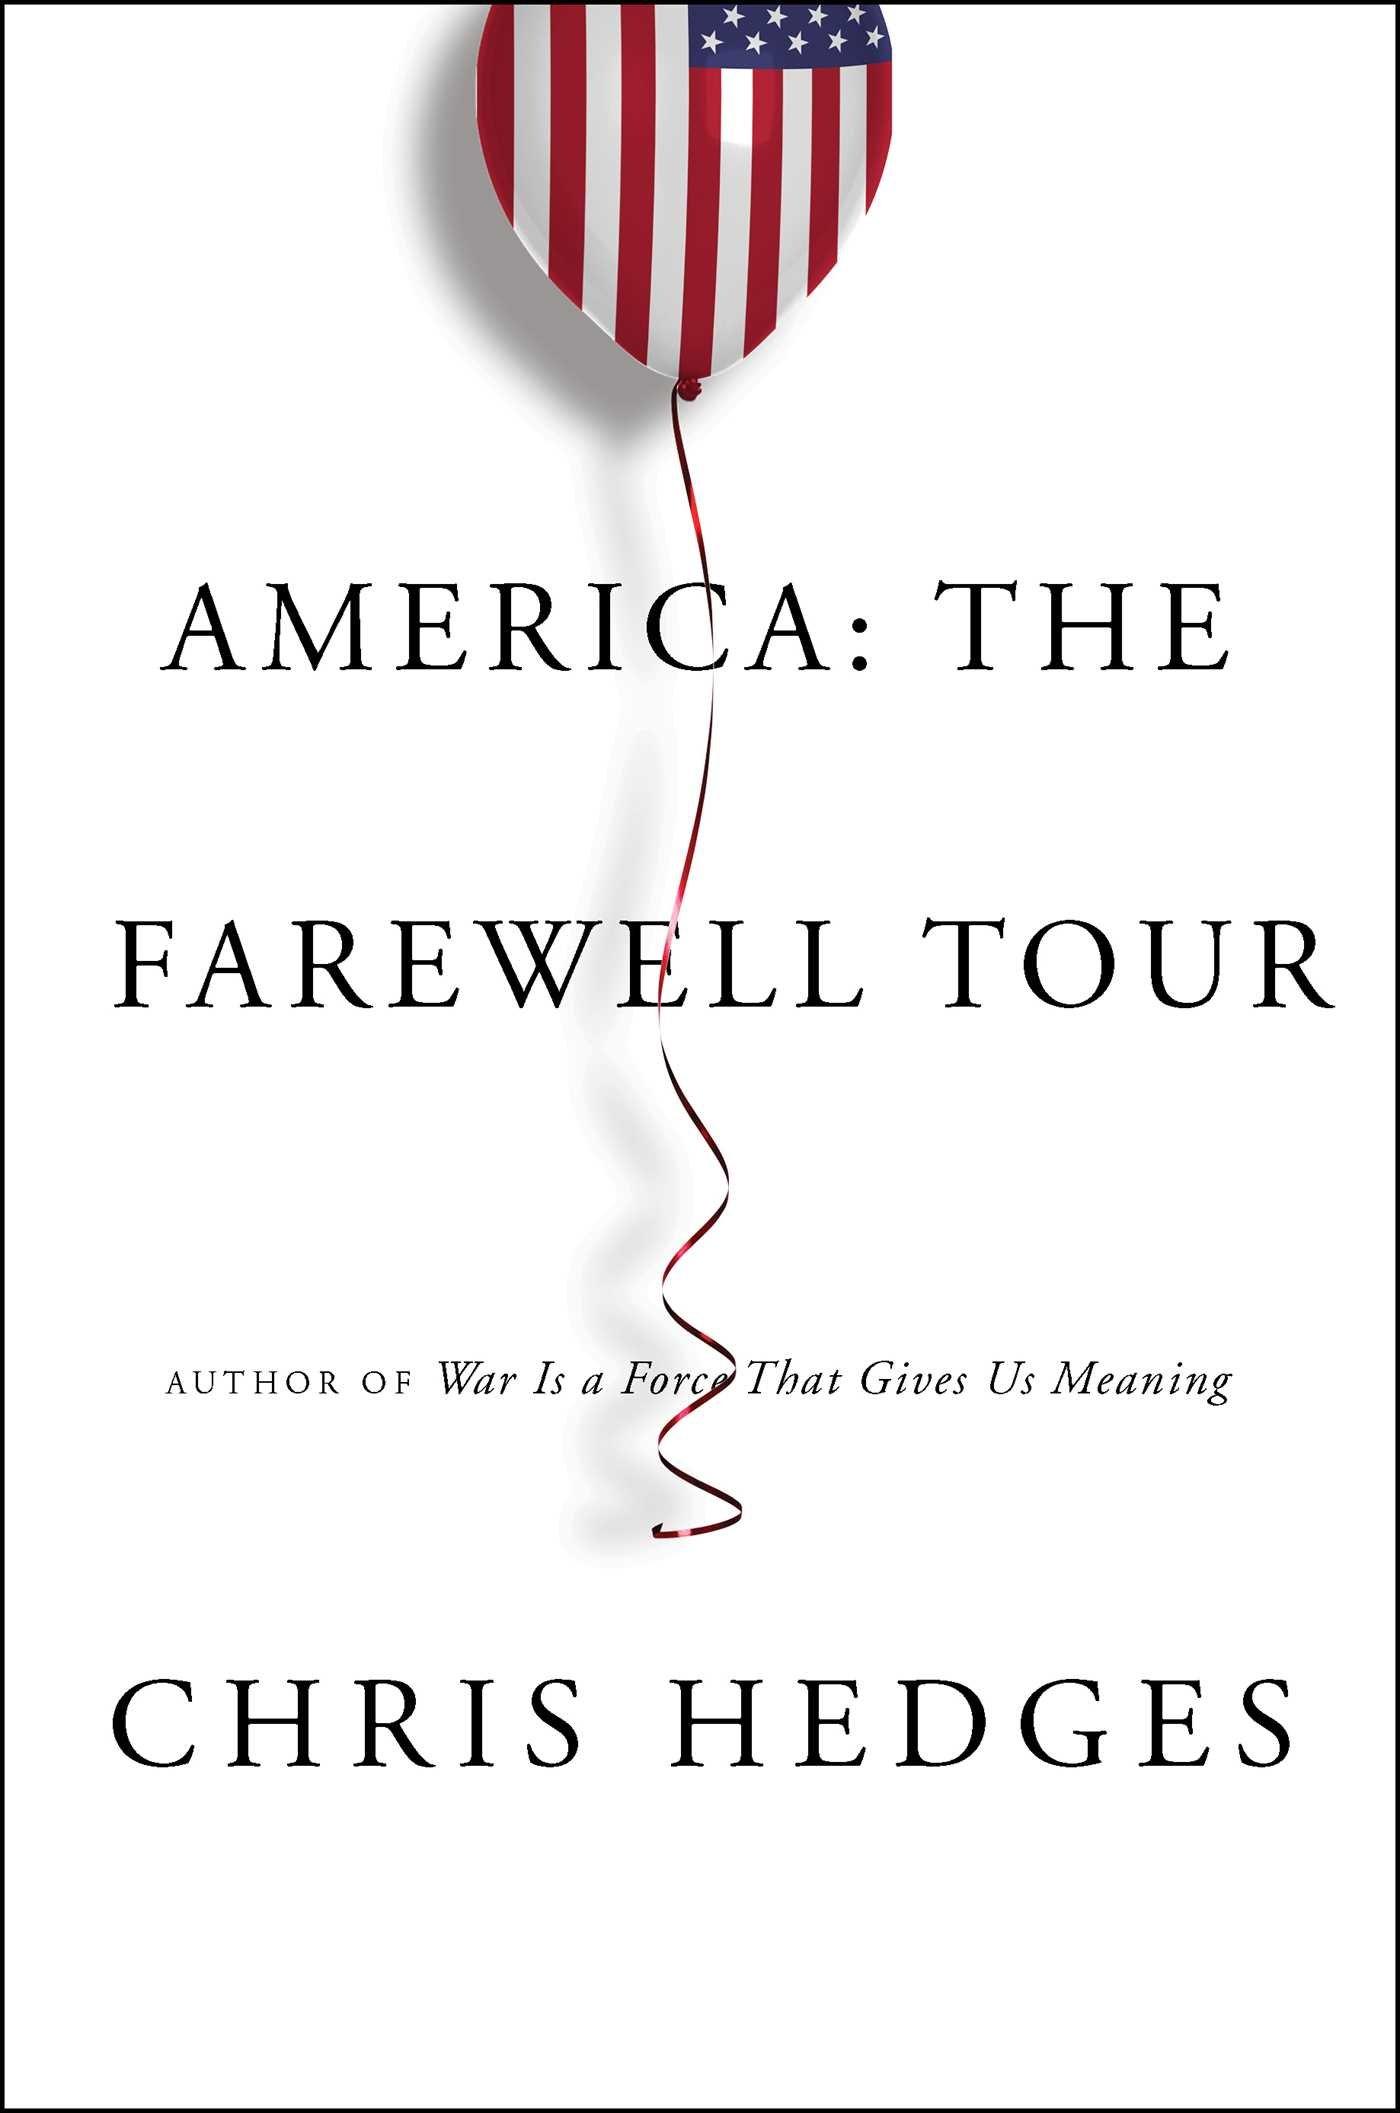 America: The Farewell Tour  by Chris Hedges  via  Simon & Schuster